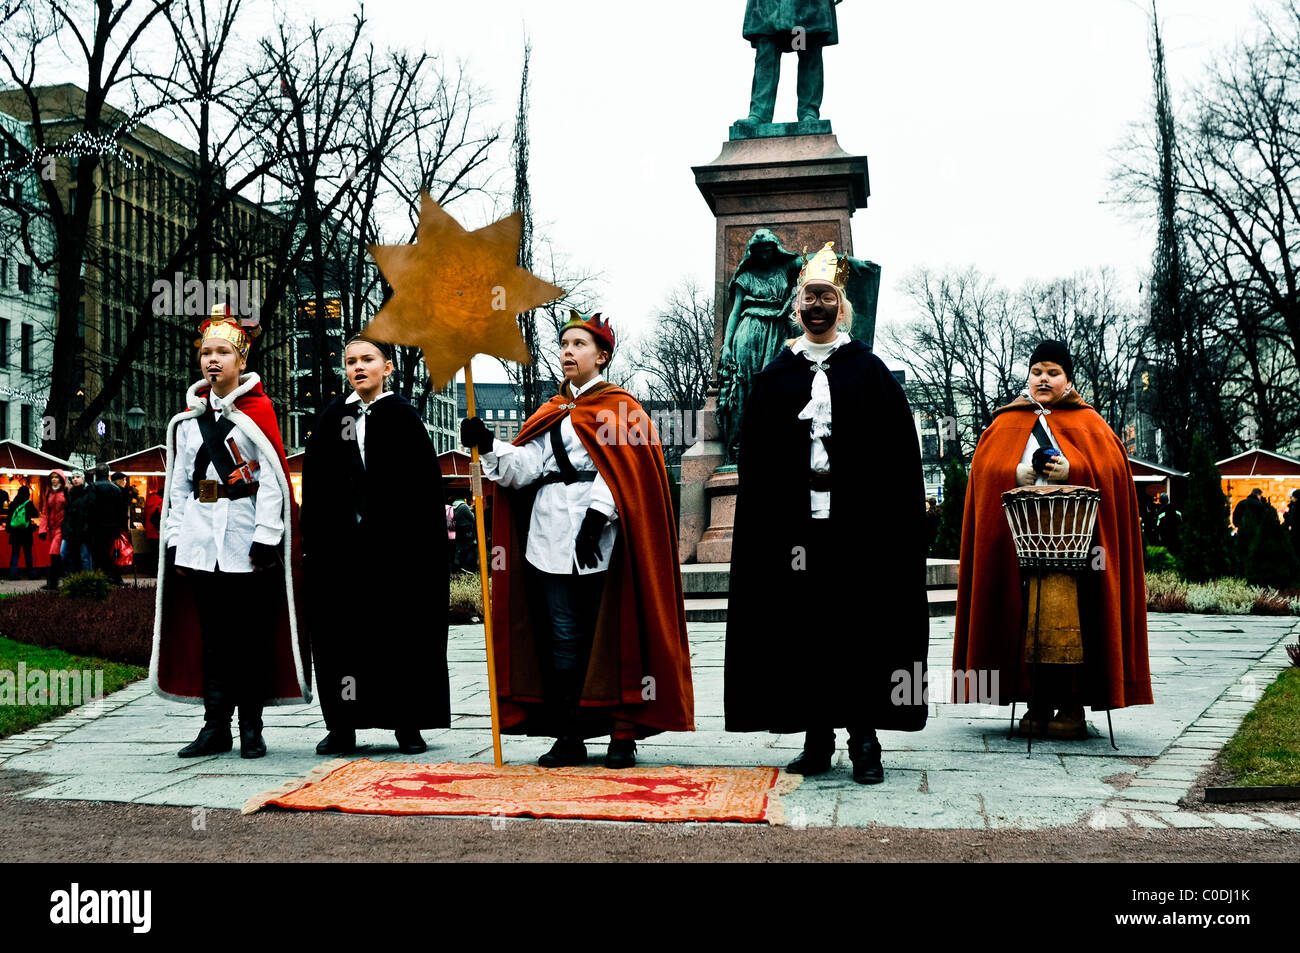 täglichen Lebens Helsinki, Weihnachten-Straßentheater-performance Stockbild